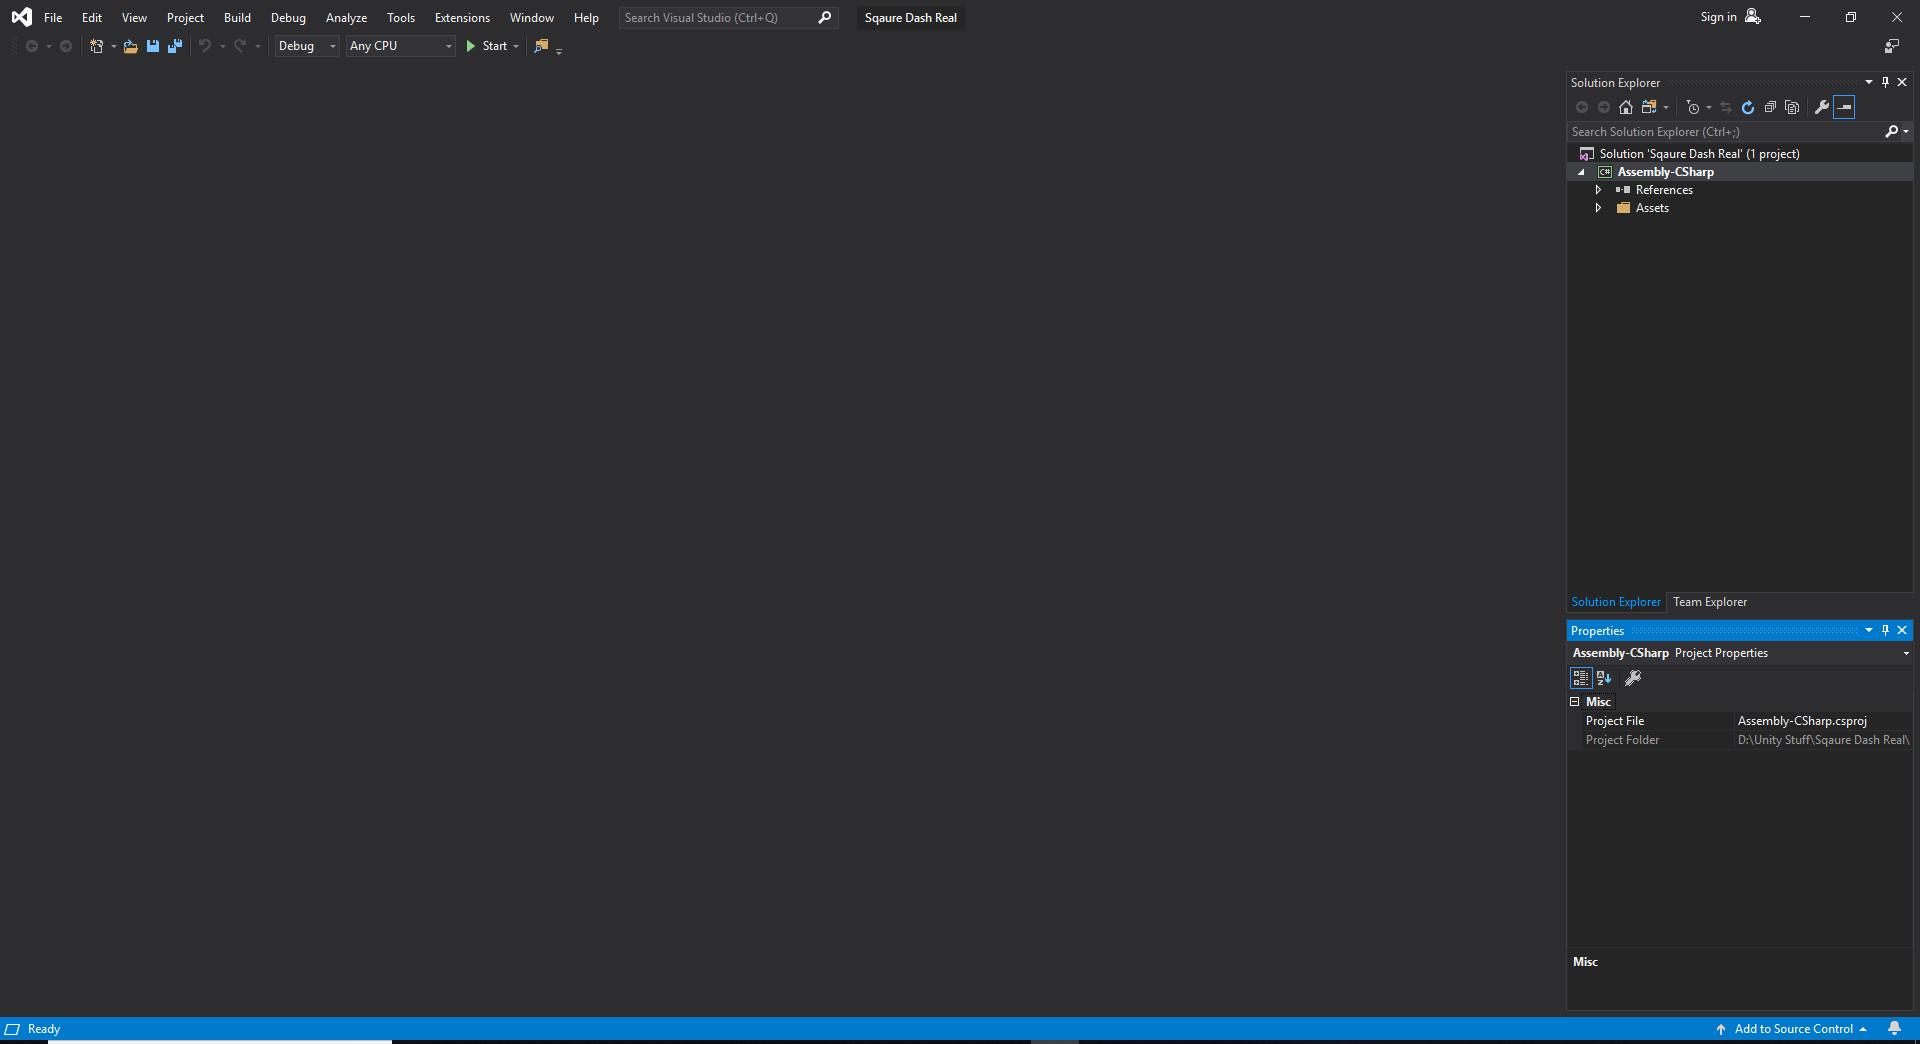 Visual Studio 2019 Blank? fe2c130b-9074-4327-bafd-d2b332d2fe80?upload=true.png